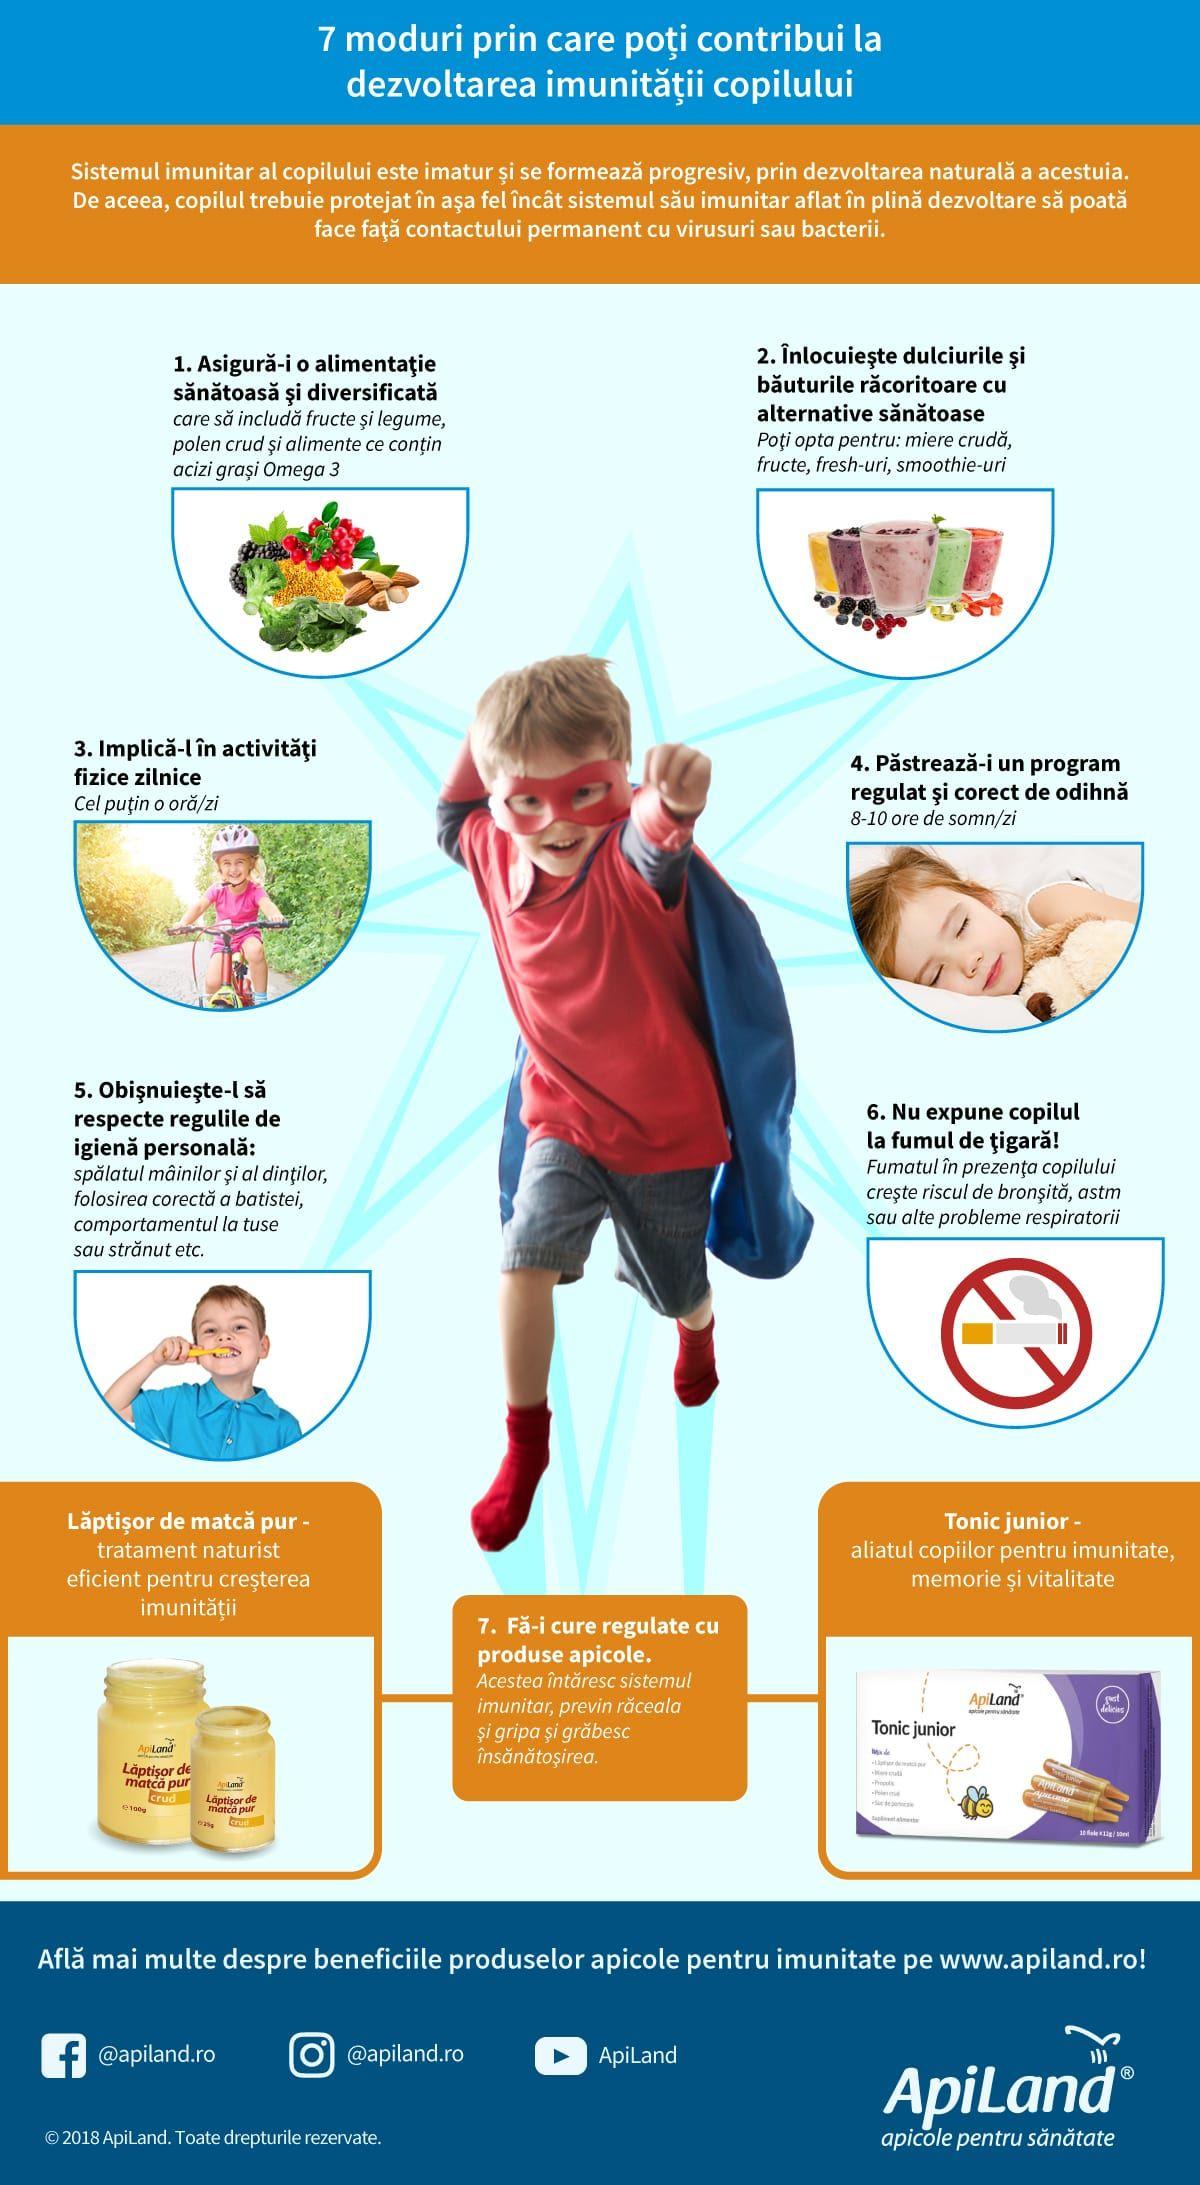 infografic apiland imunitate copii